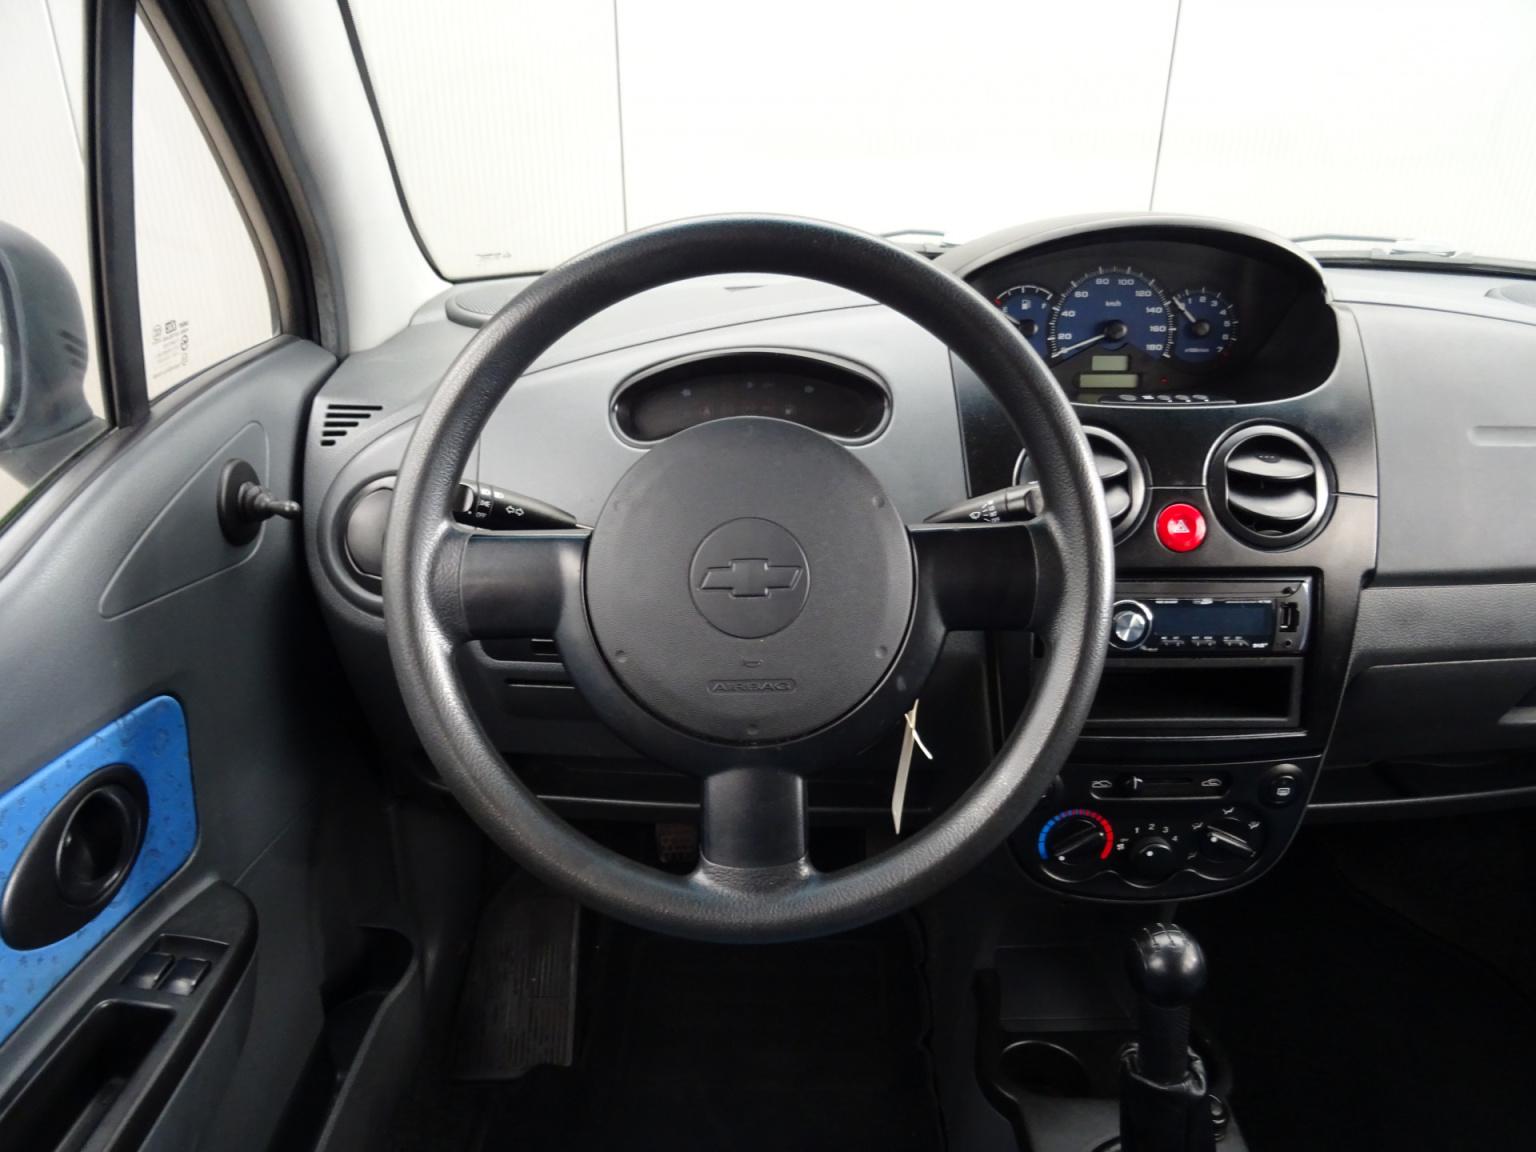 Chevrolet-Matiz-13